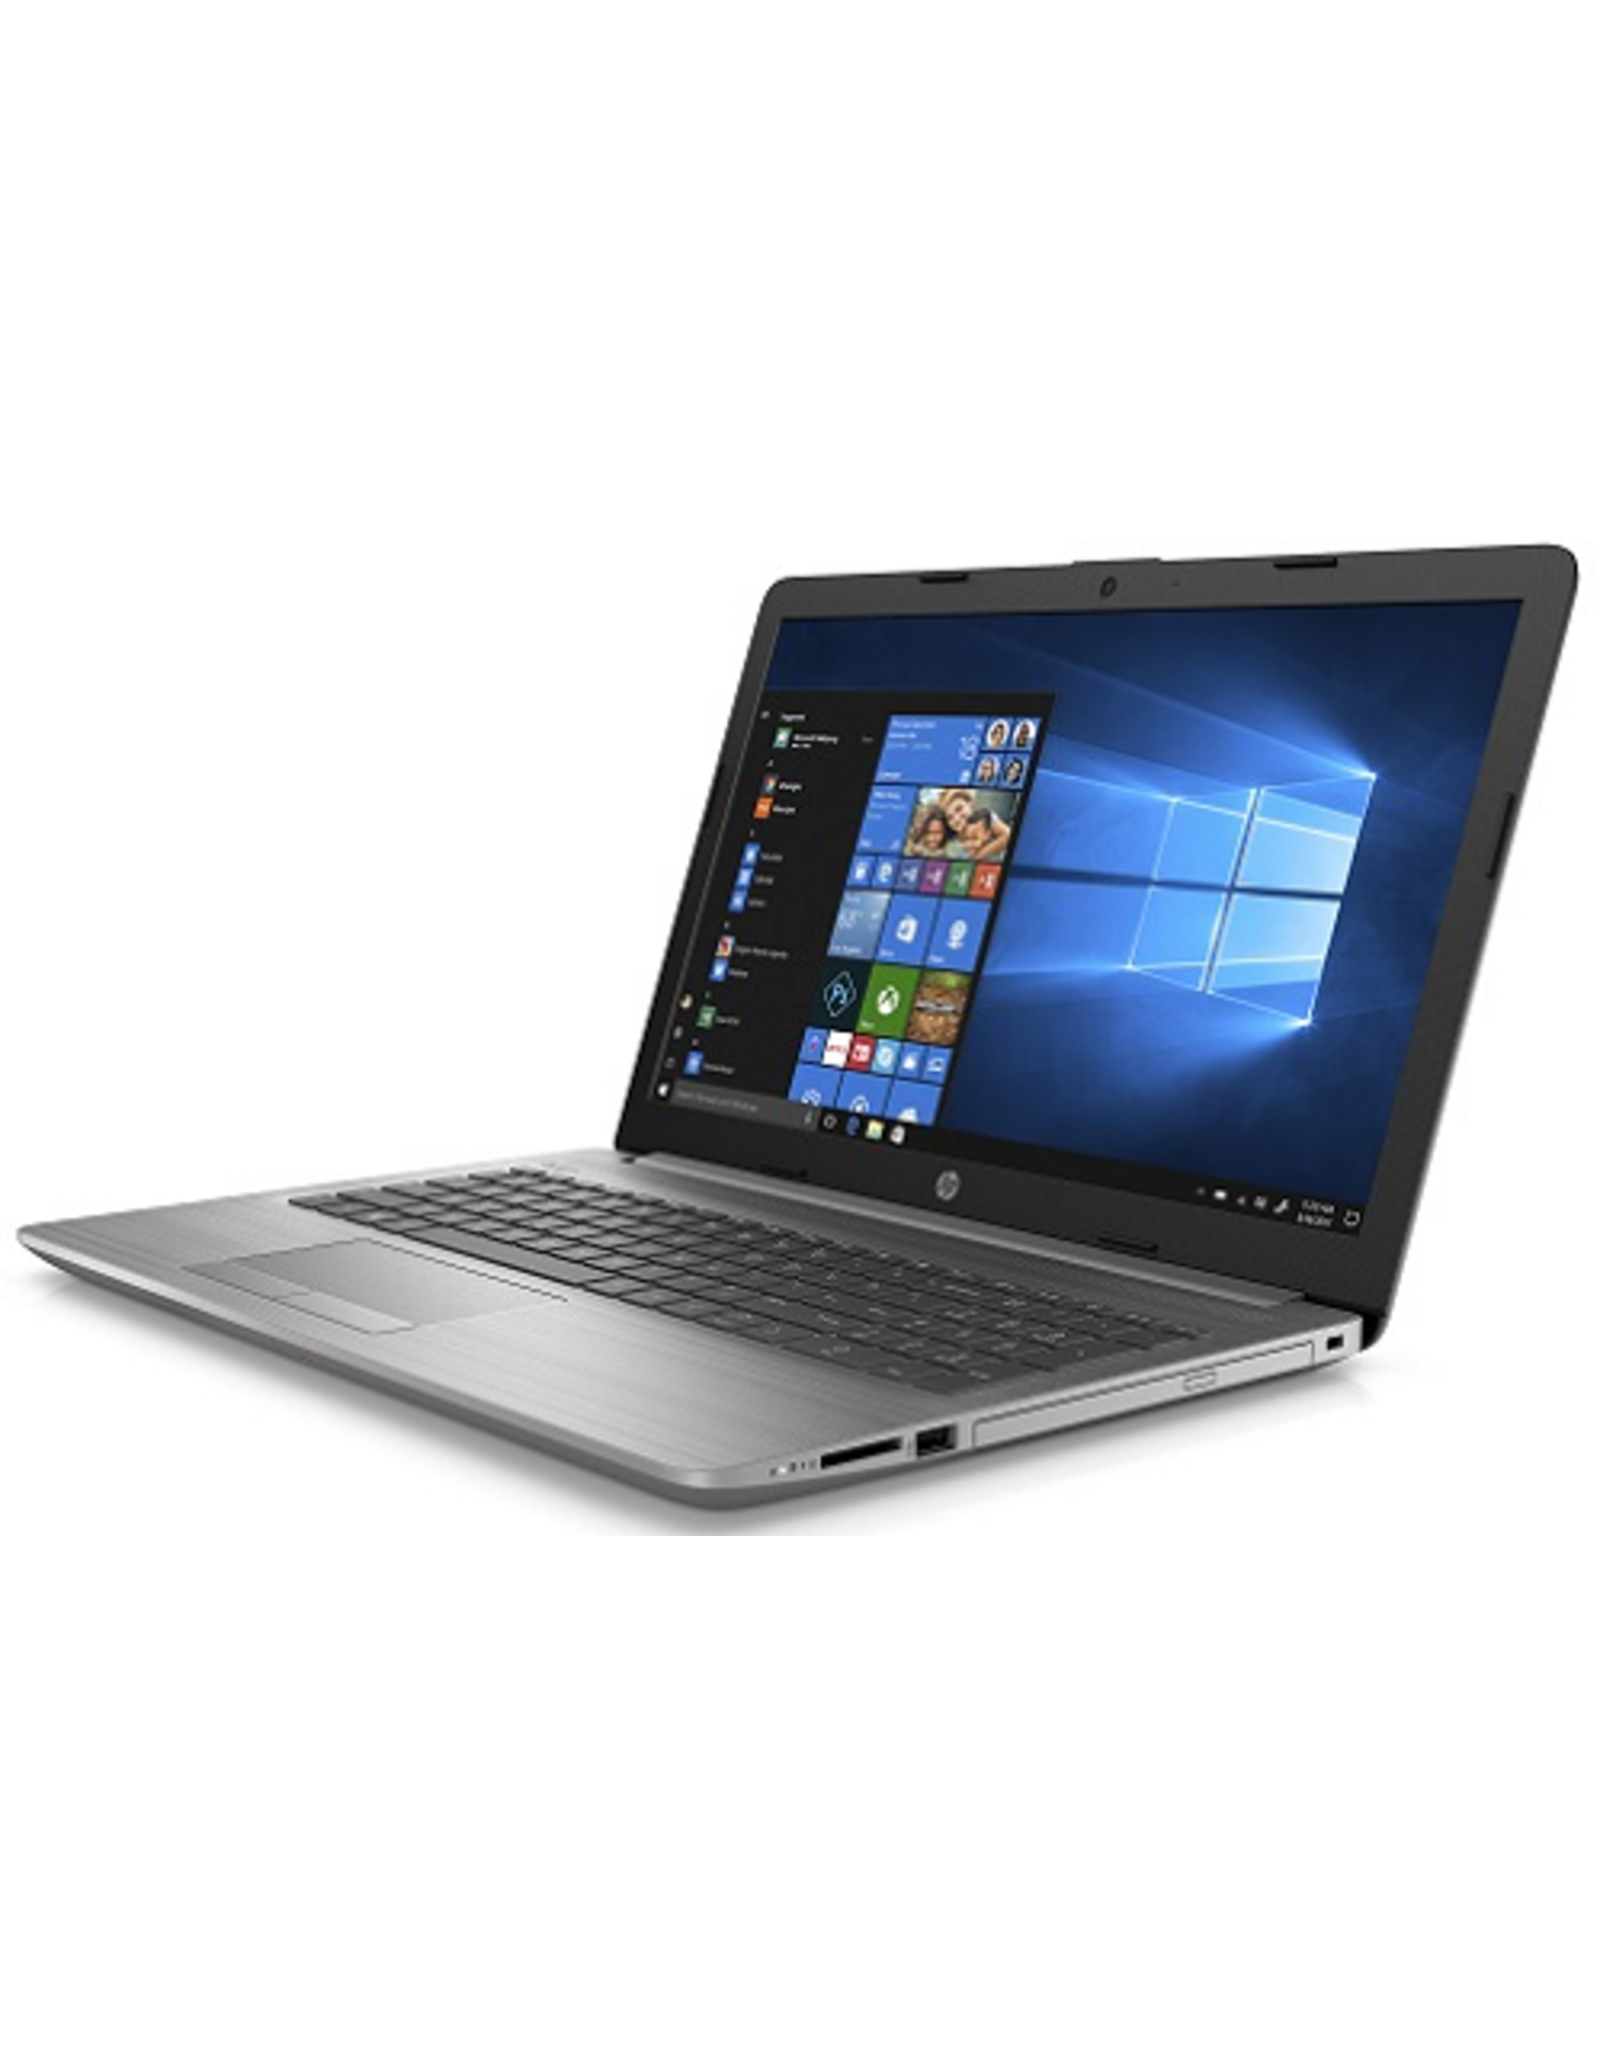 "HP HP Laptop 15.6"" 255G7 500GB"